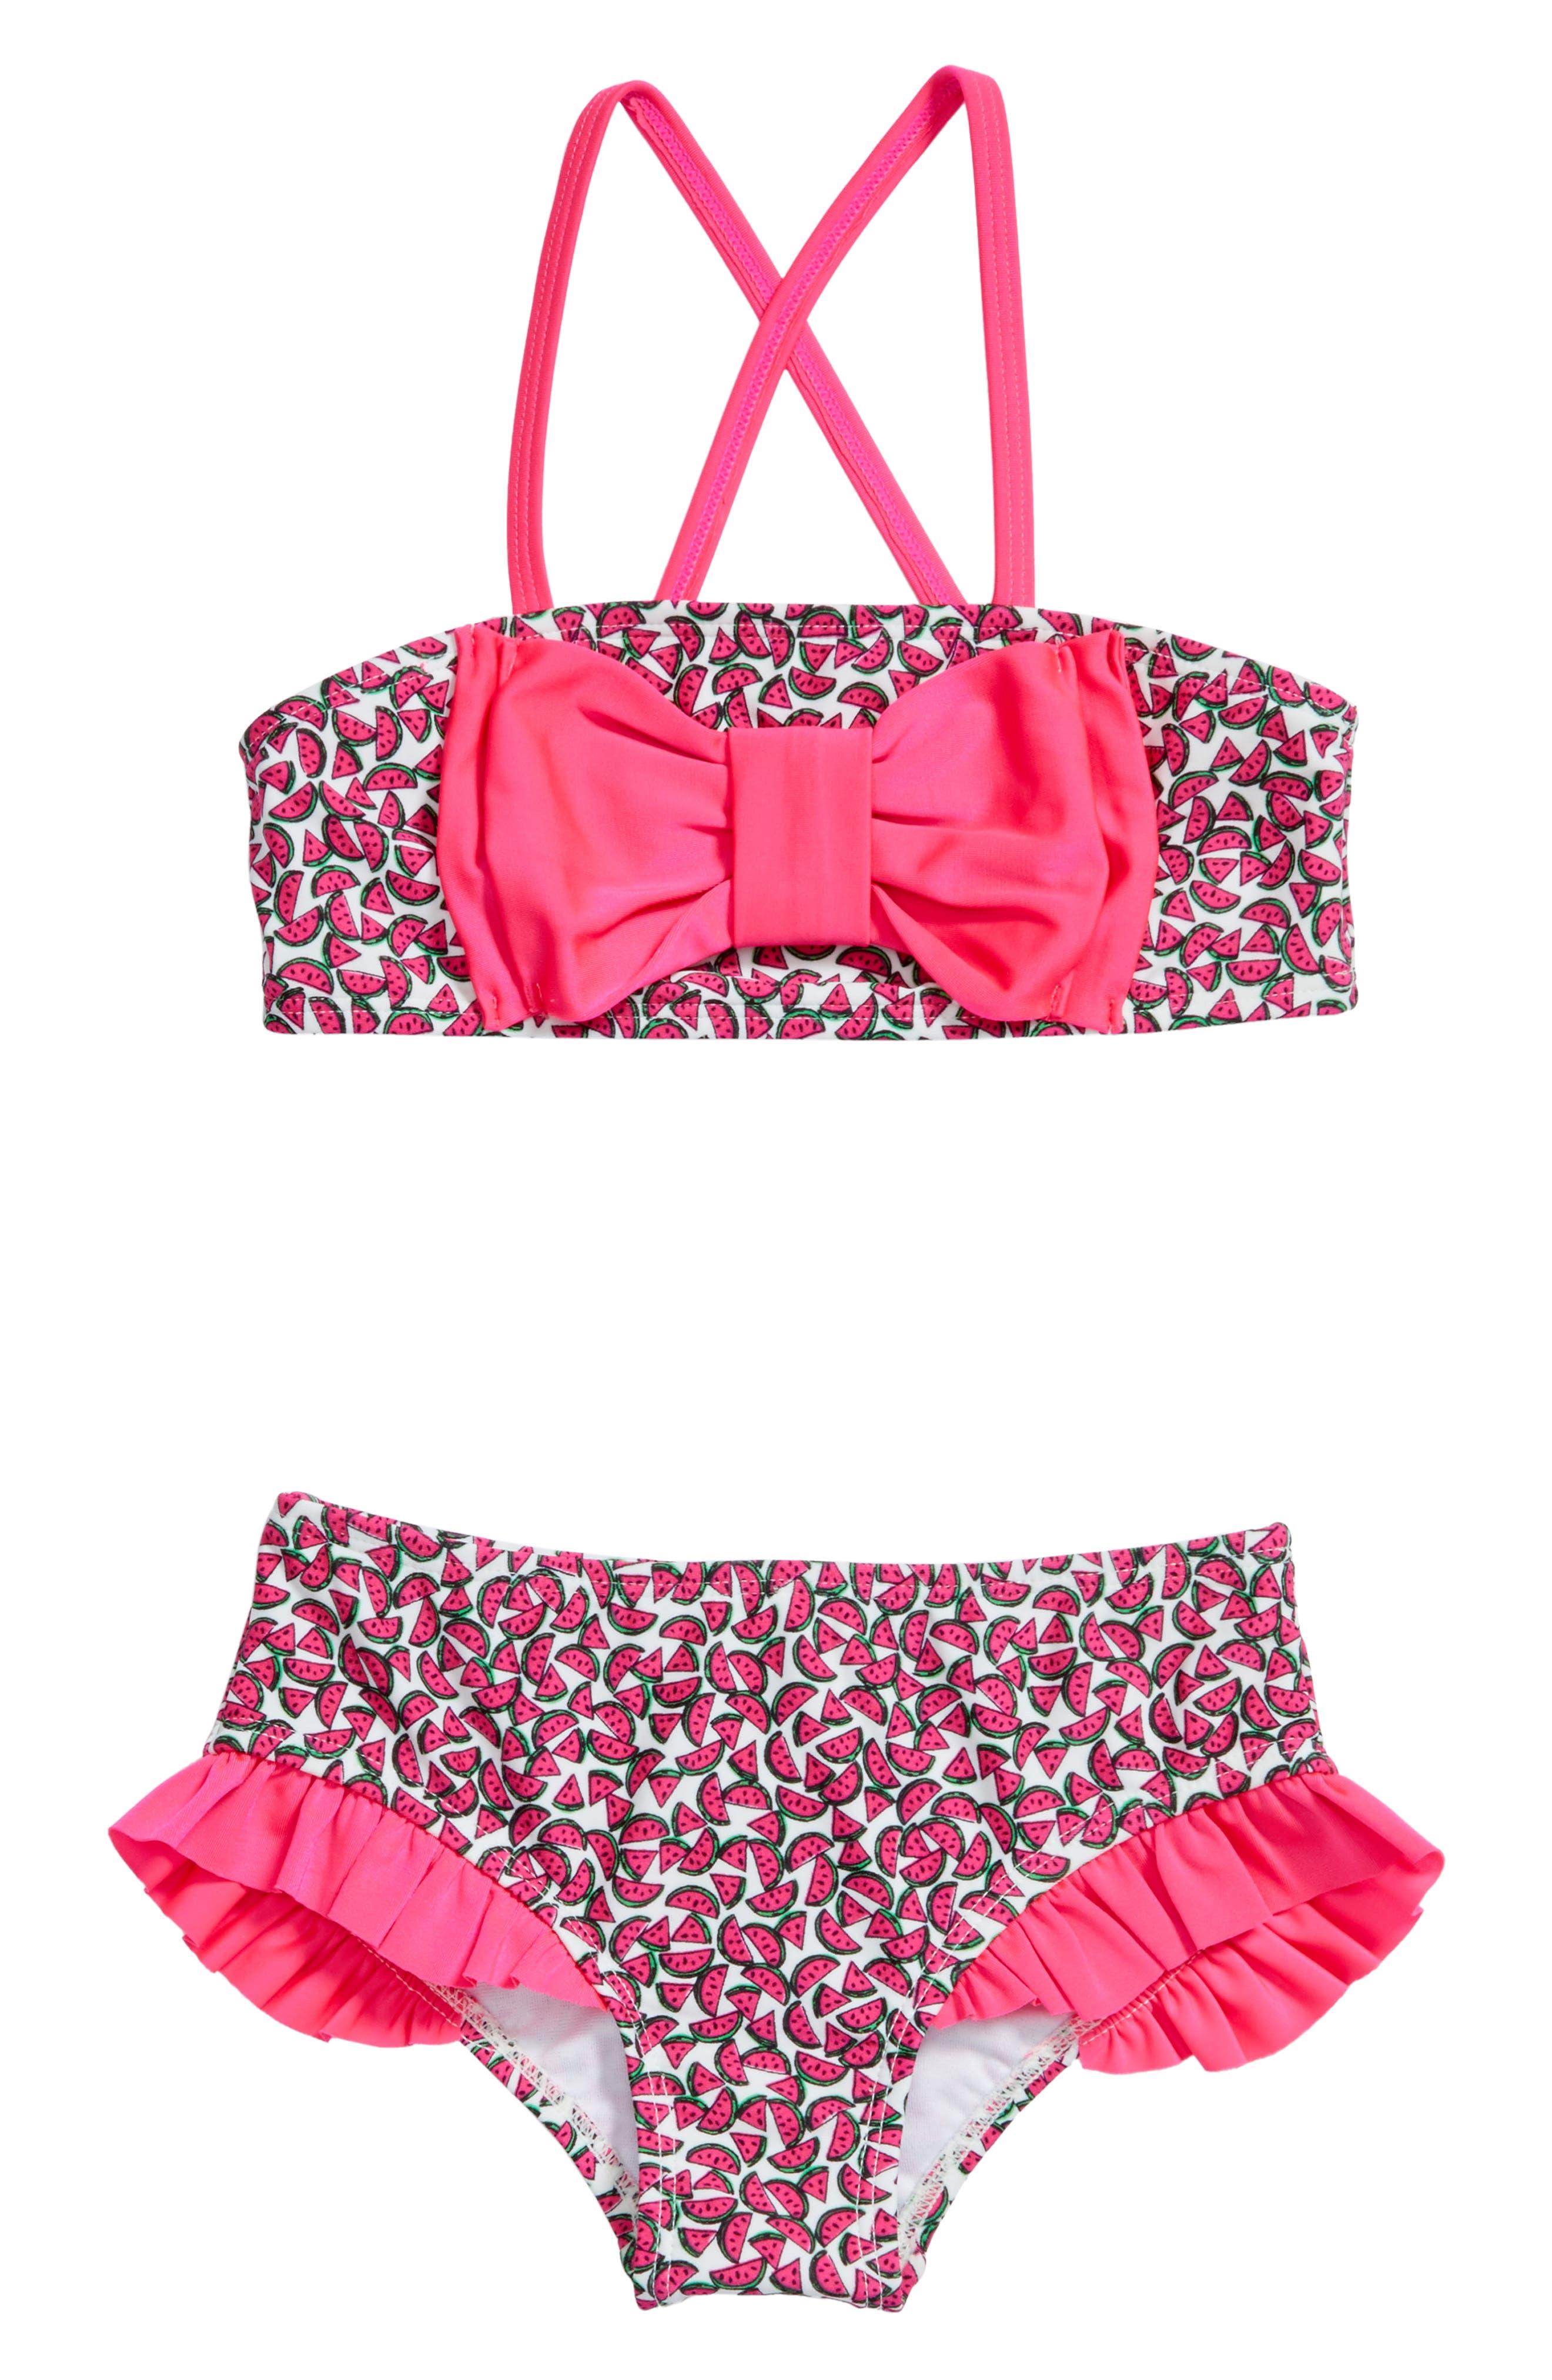 Watermelon Two-Piece Swimsuit,                         Main,                         color, Cream/ Multi